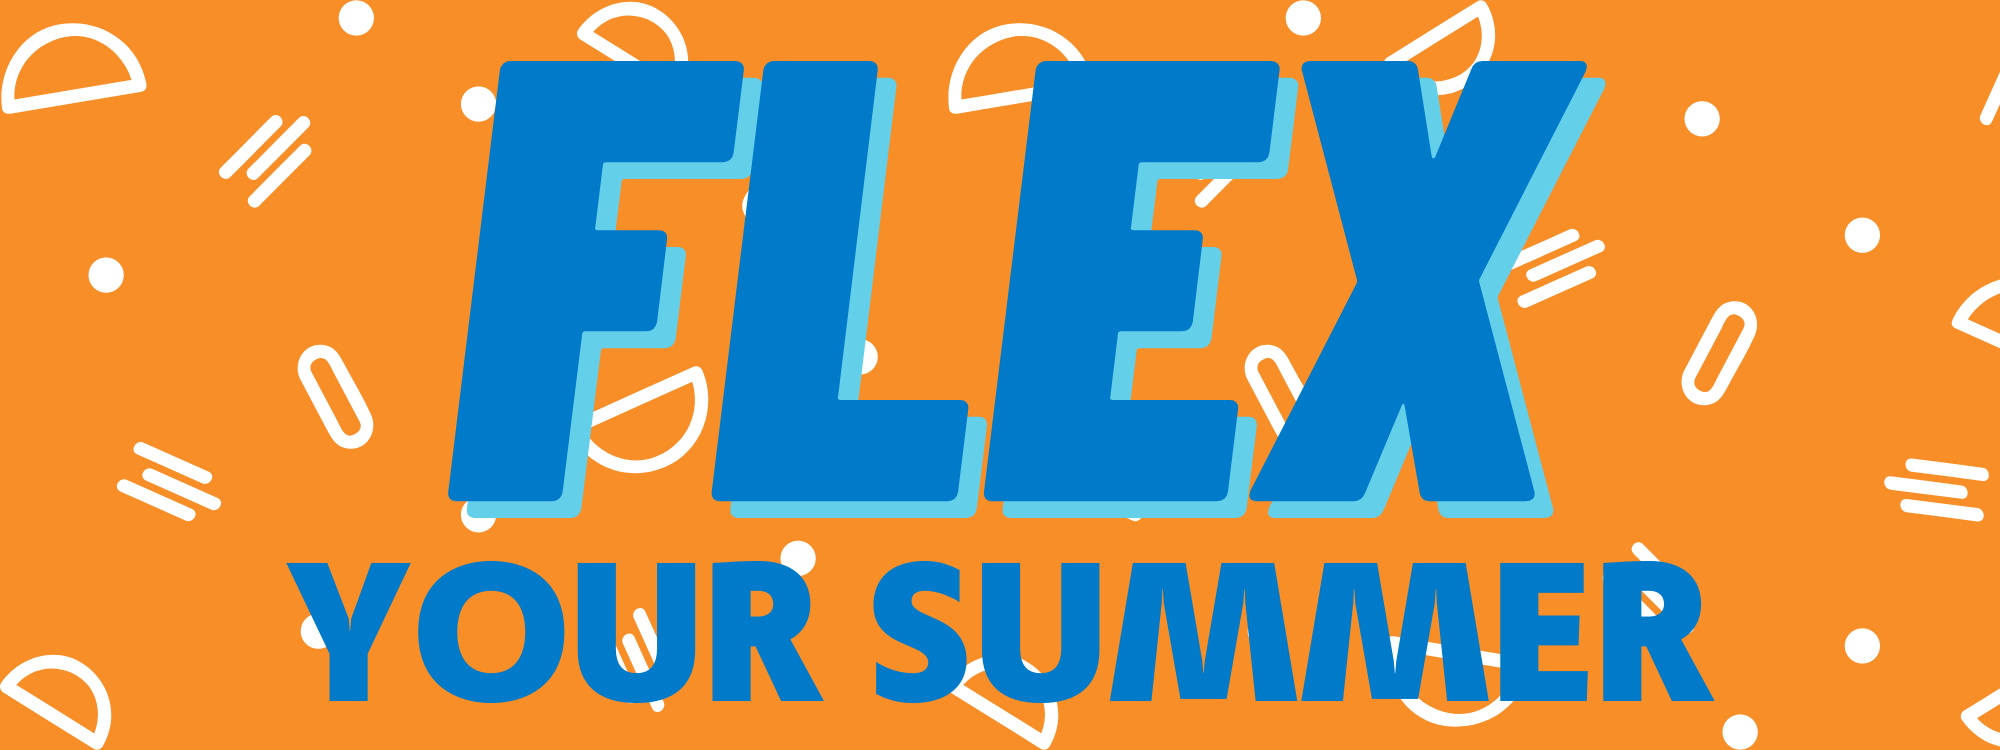 FLEX YOUR SUMMER